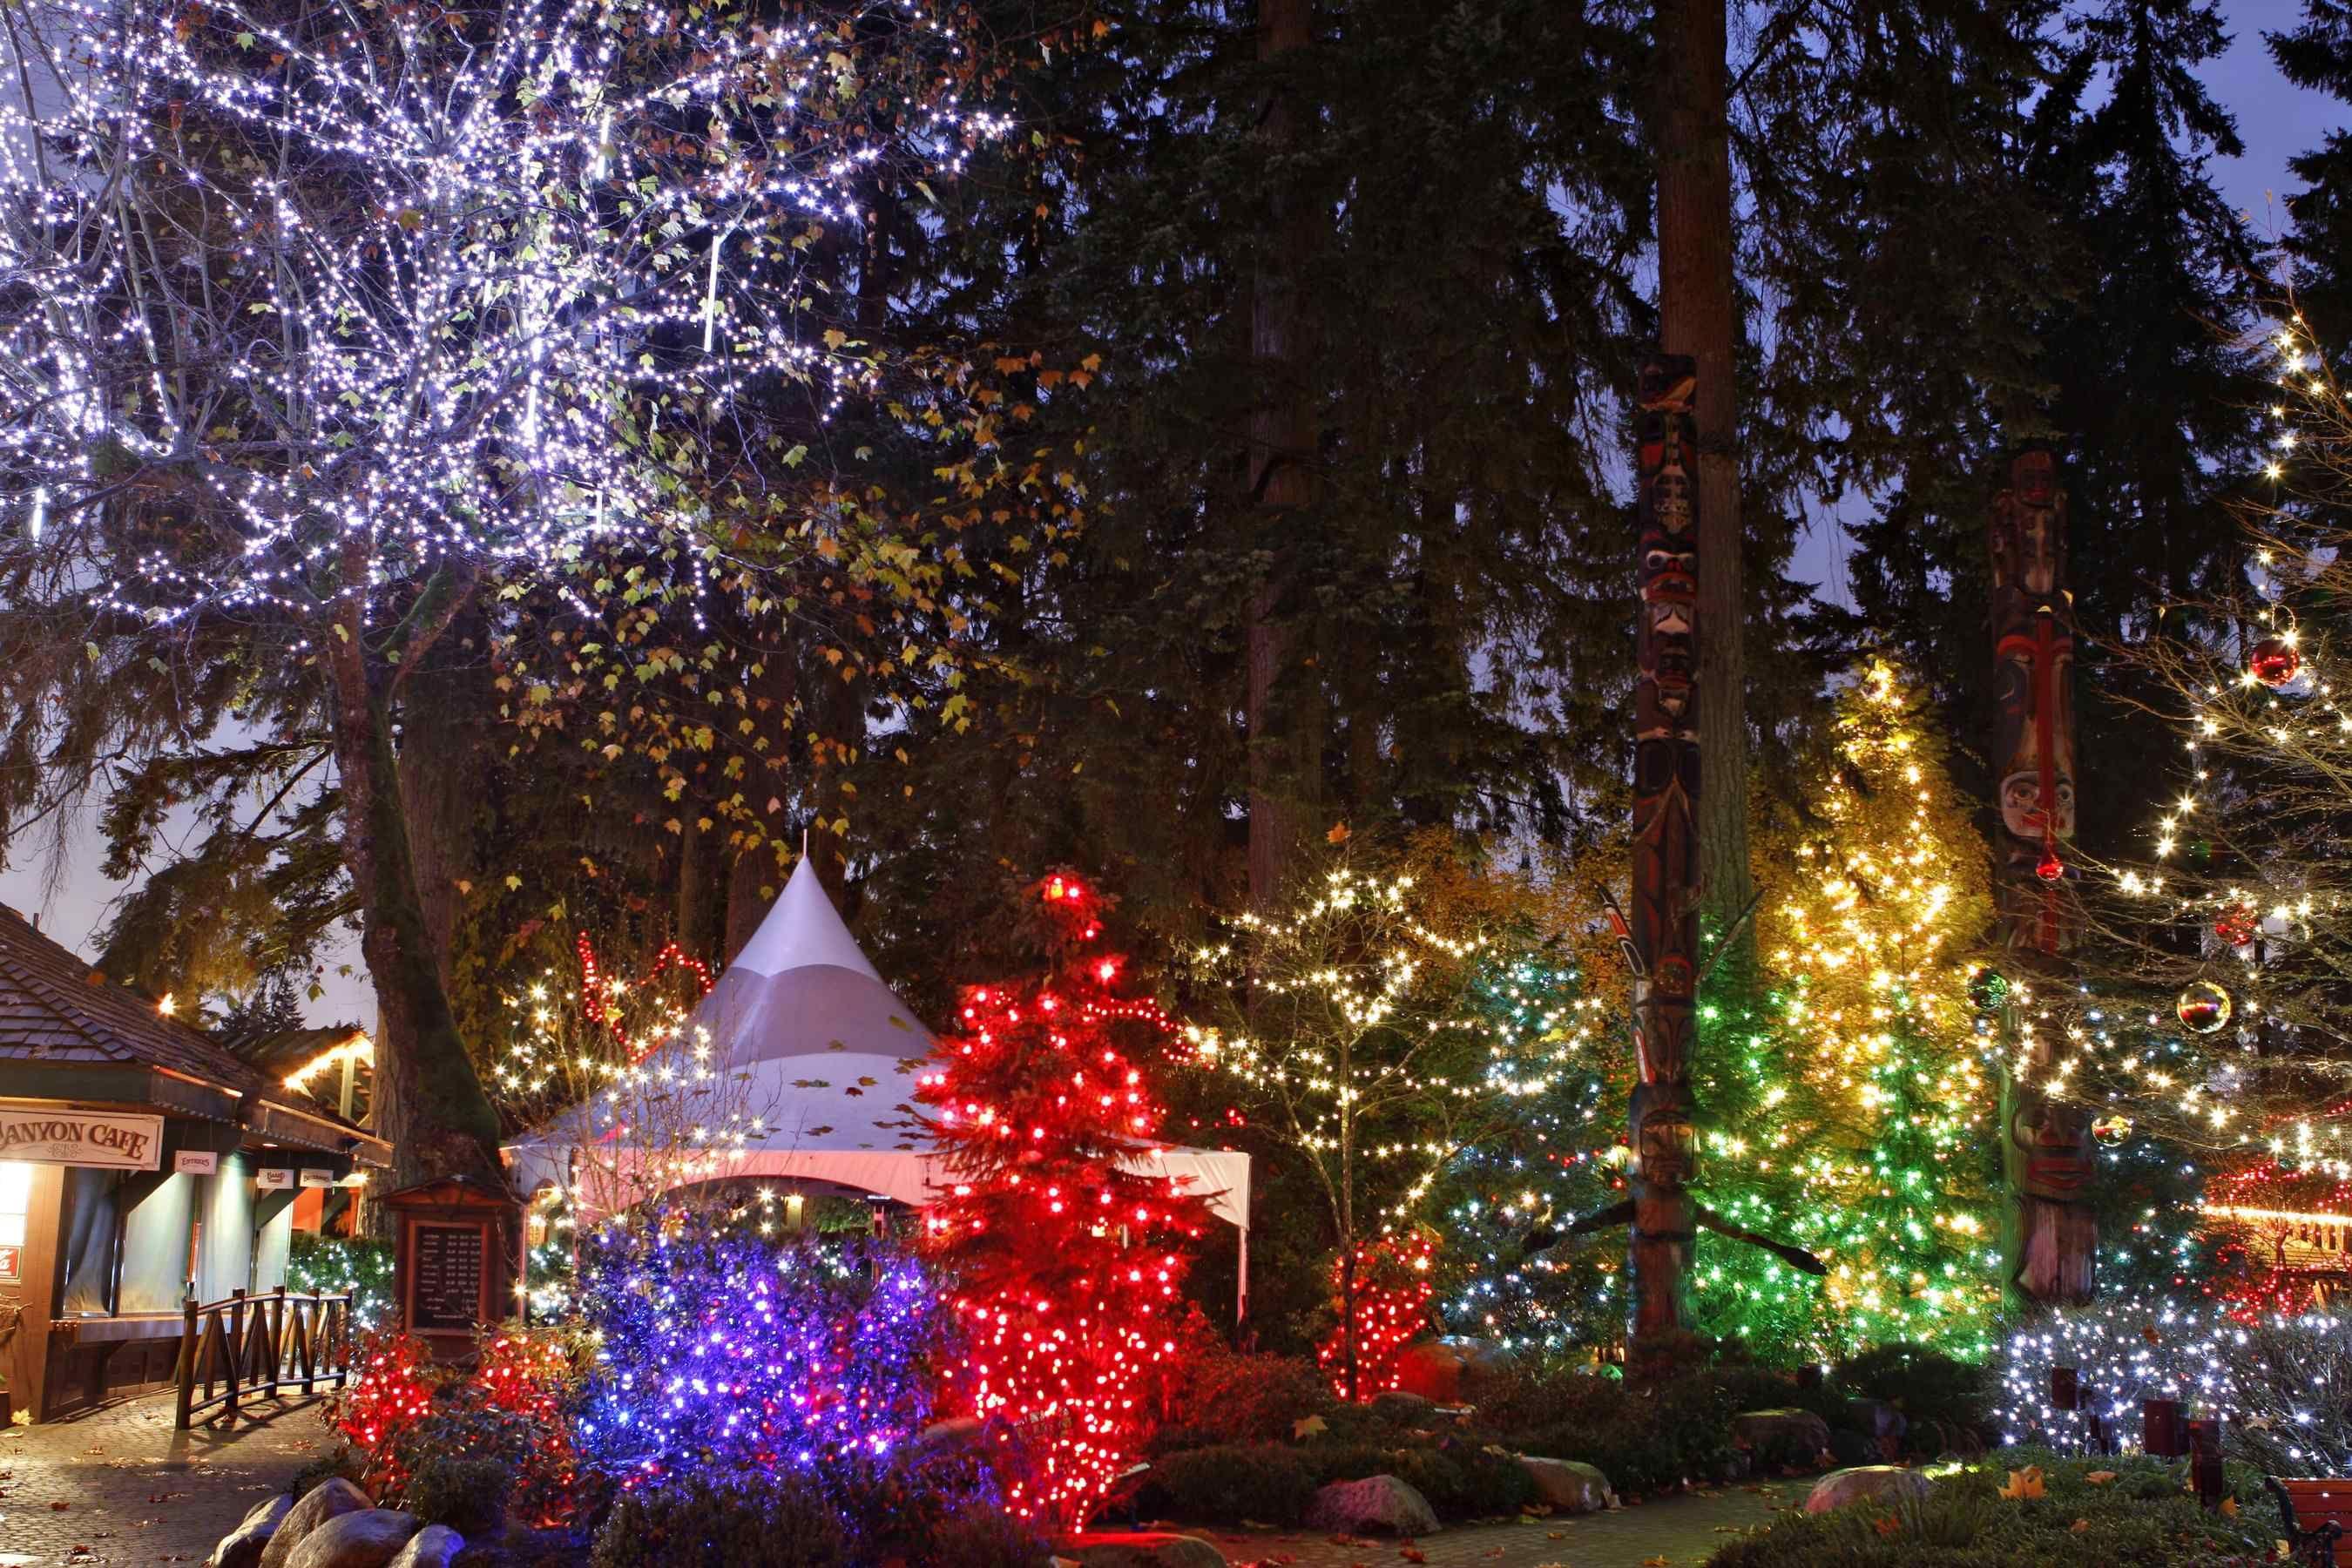 Canyon Lights Christmas Events North Vancouver Christmas Events Suspension Bridge Canada Christmas